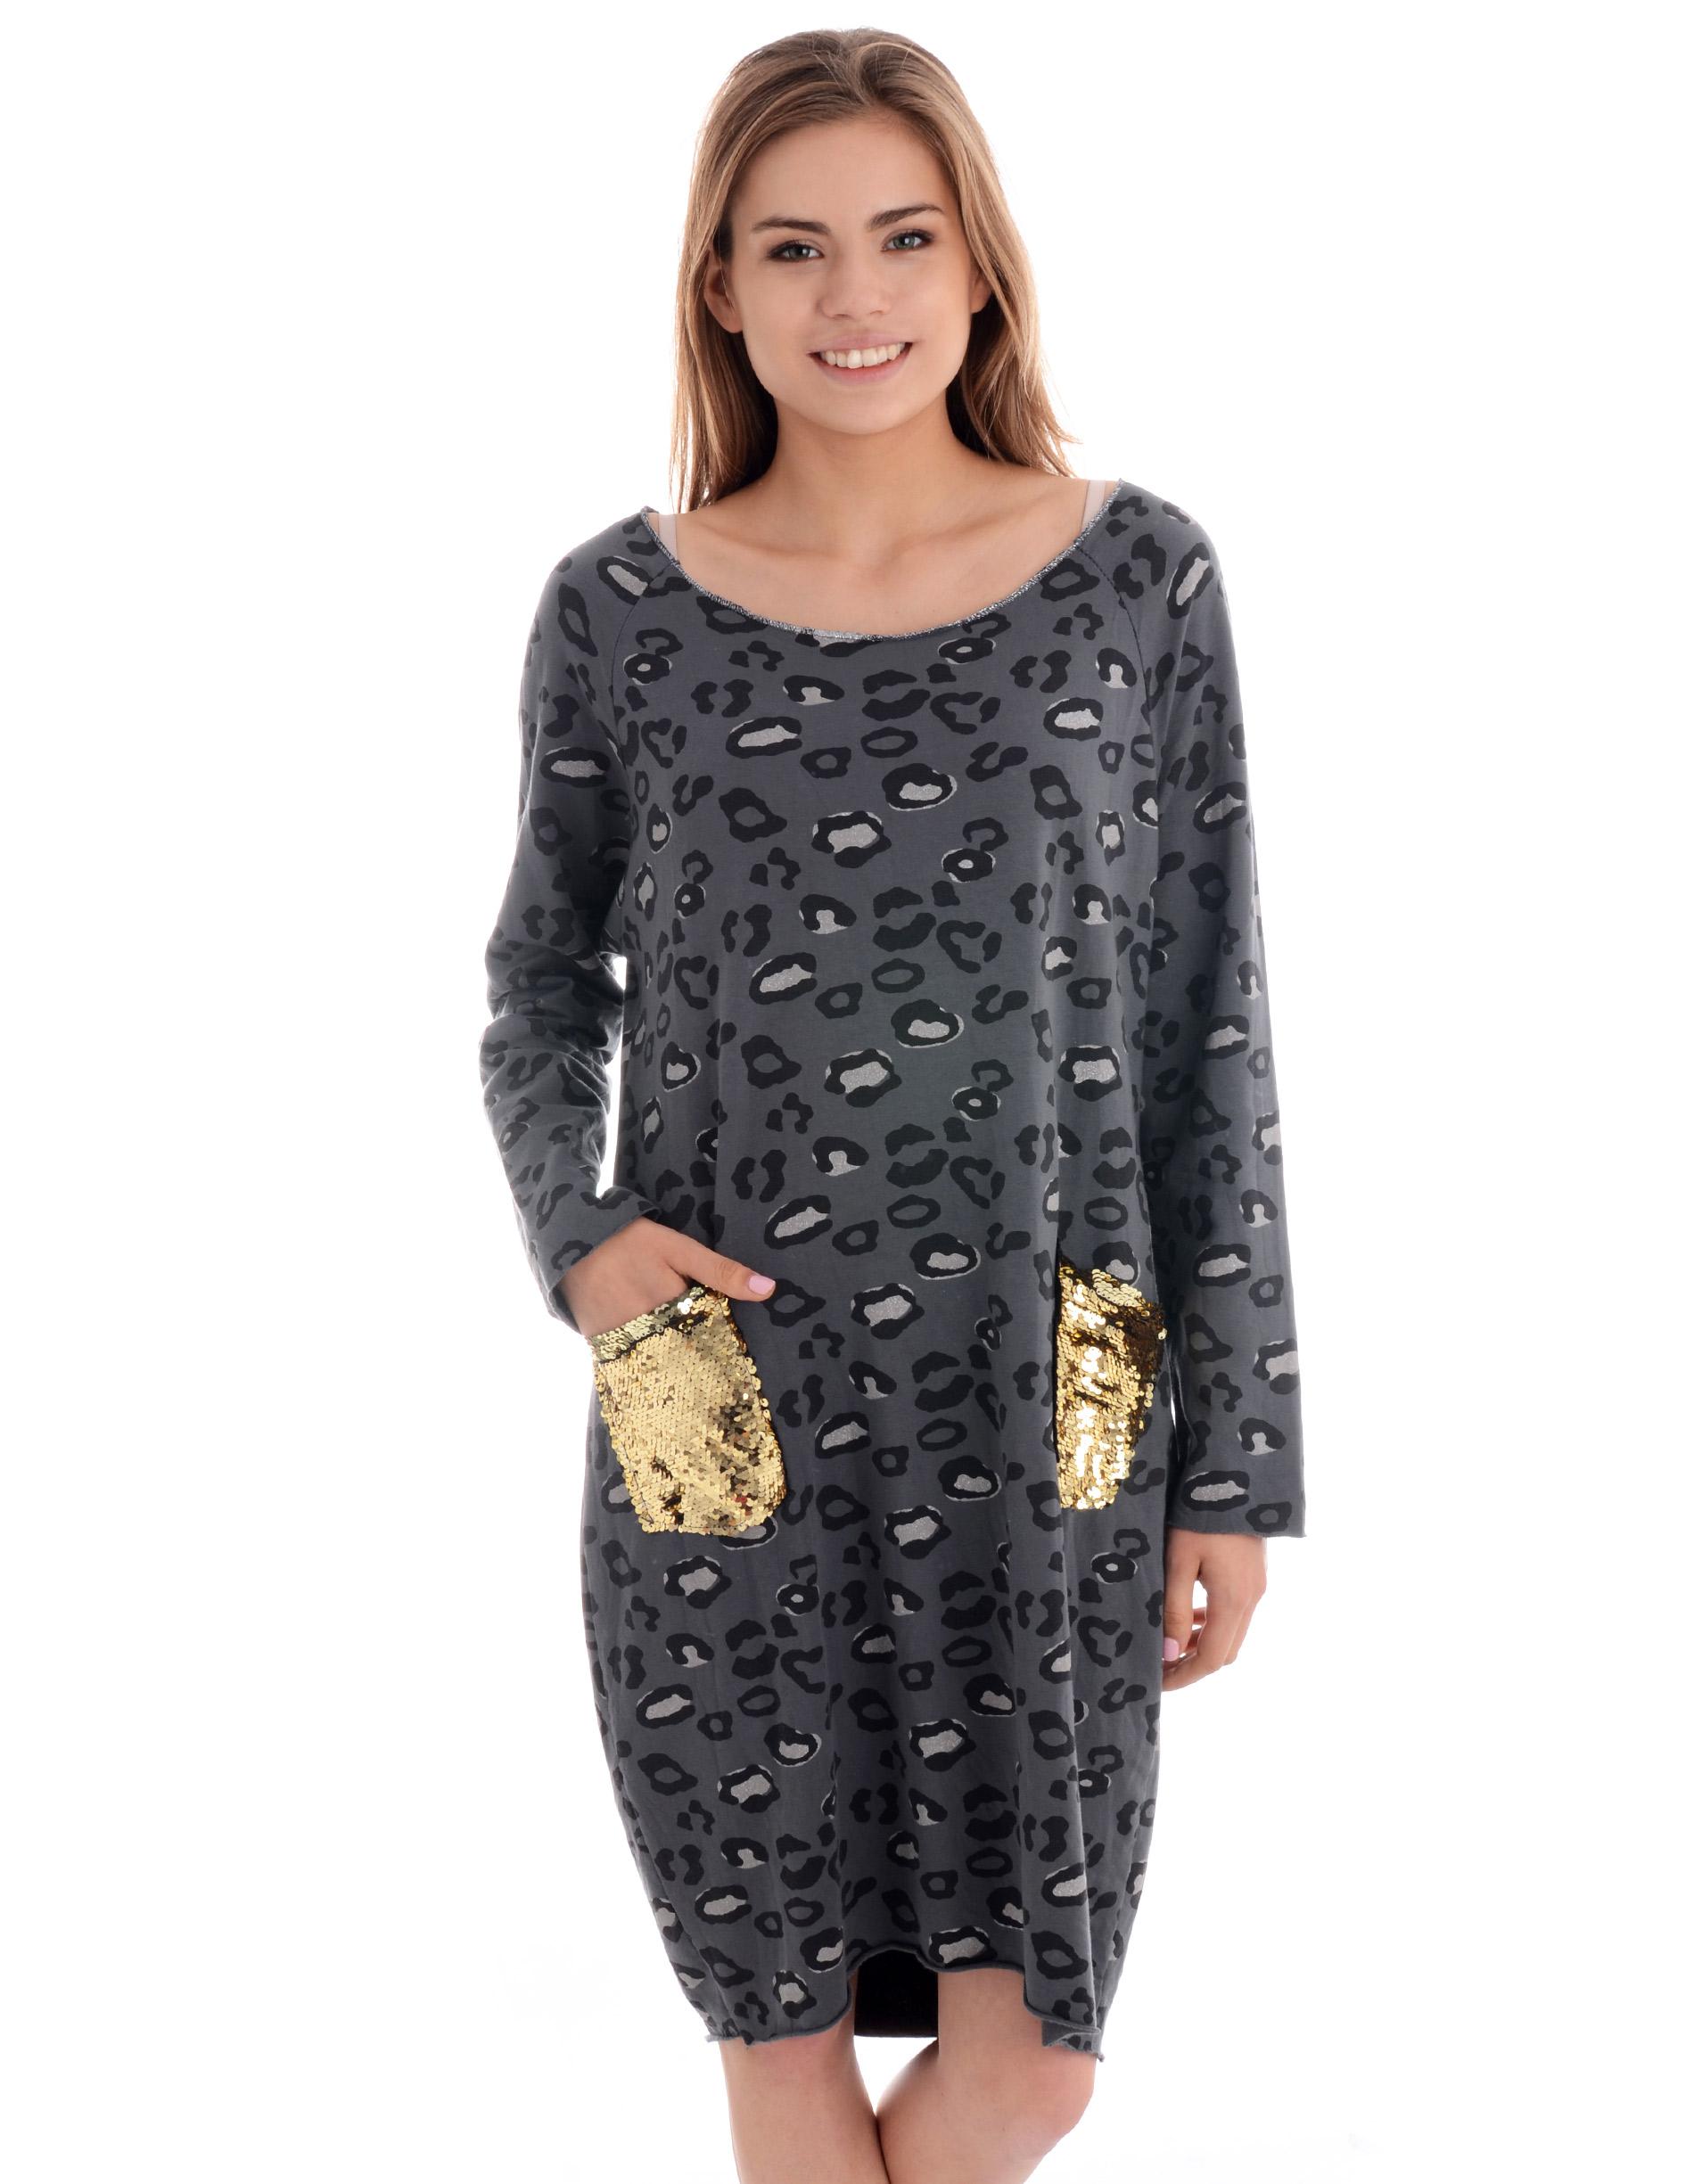 Sukienka - 137-3019 GRIG - Unisono